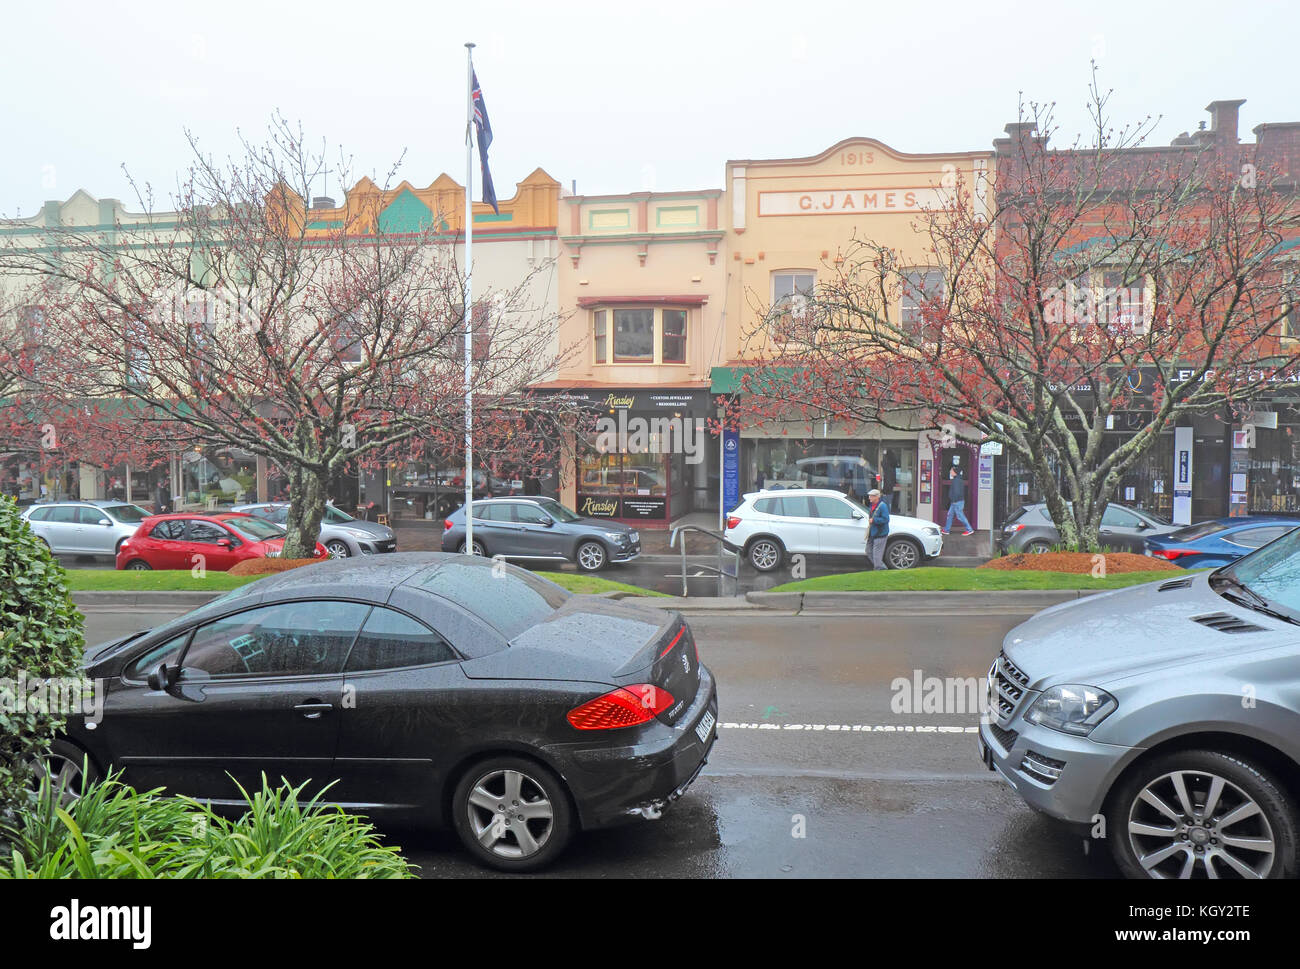 LEURA, AUSTRALIA - SEPTEMBER 25 2015: Shops and pedestrians along Leura Mall, the main thoroughfare through Leura, Stock Photo